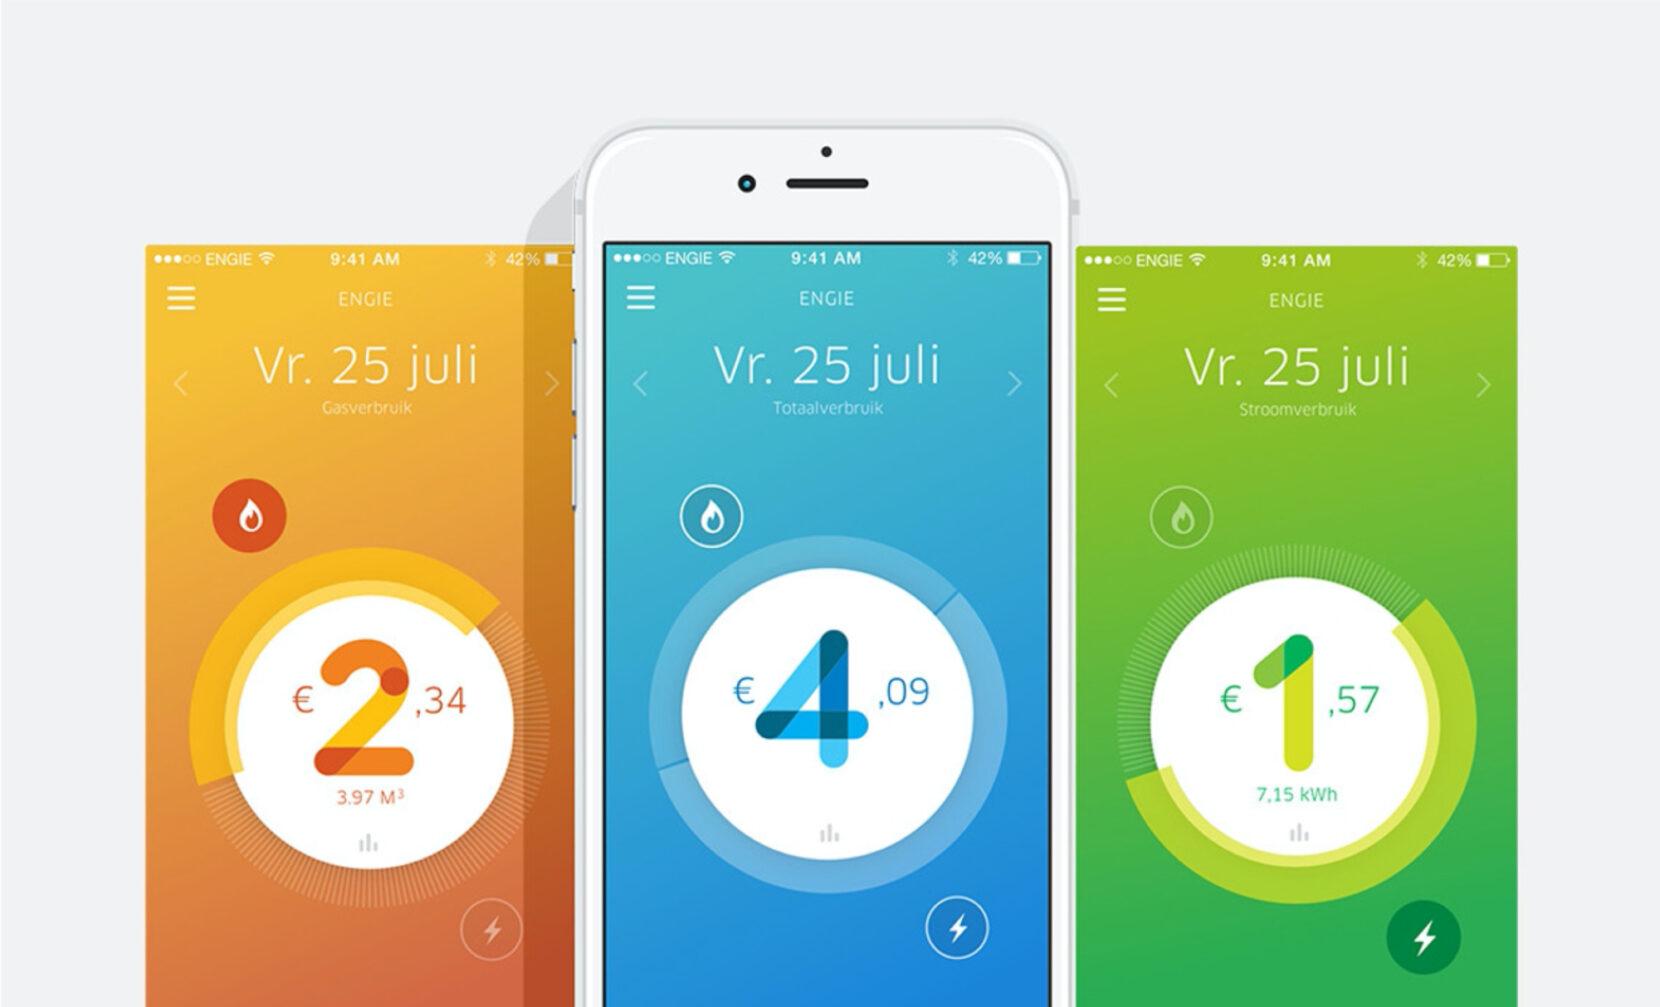 Engie smartphone app 1